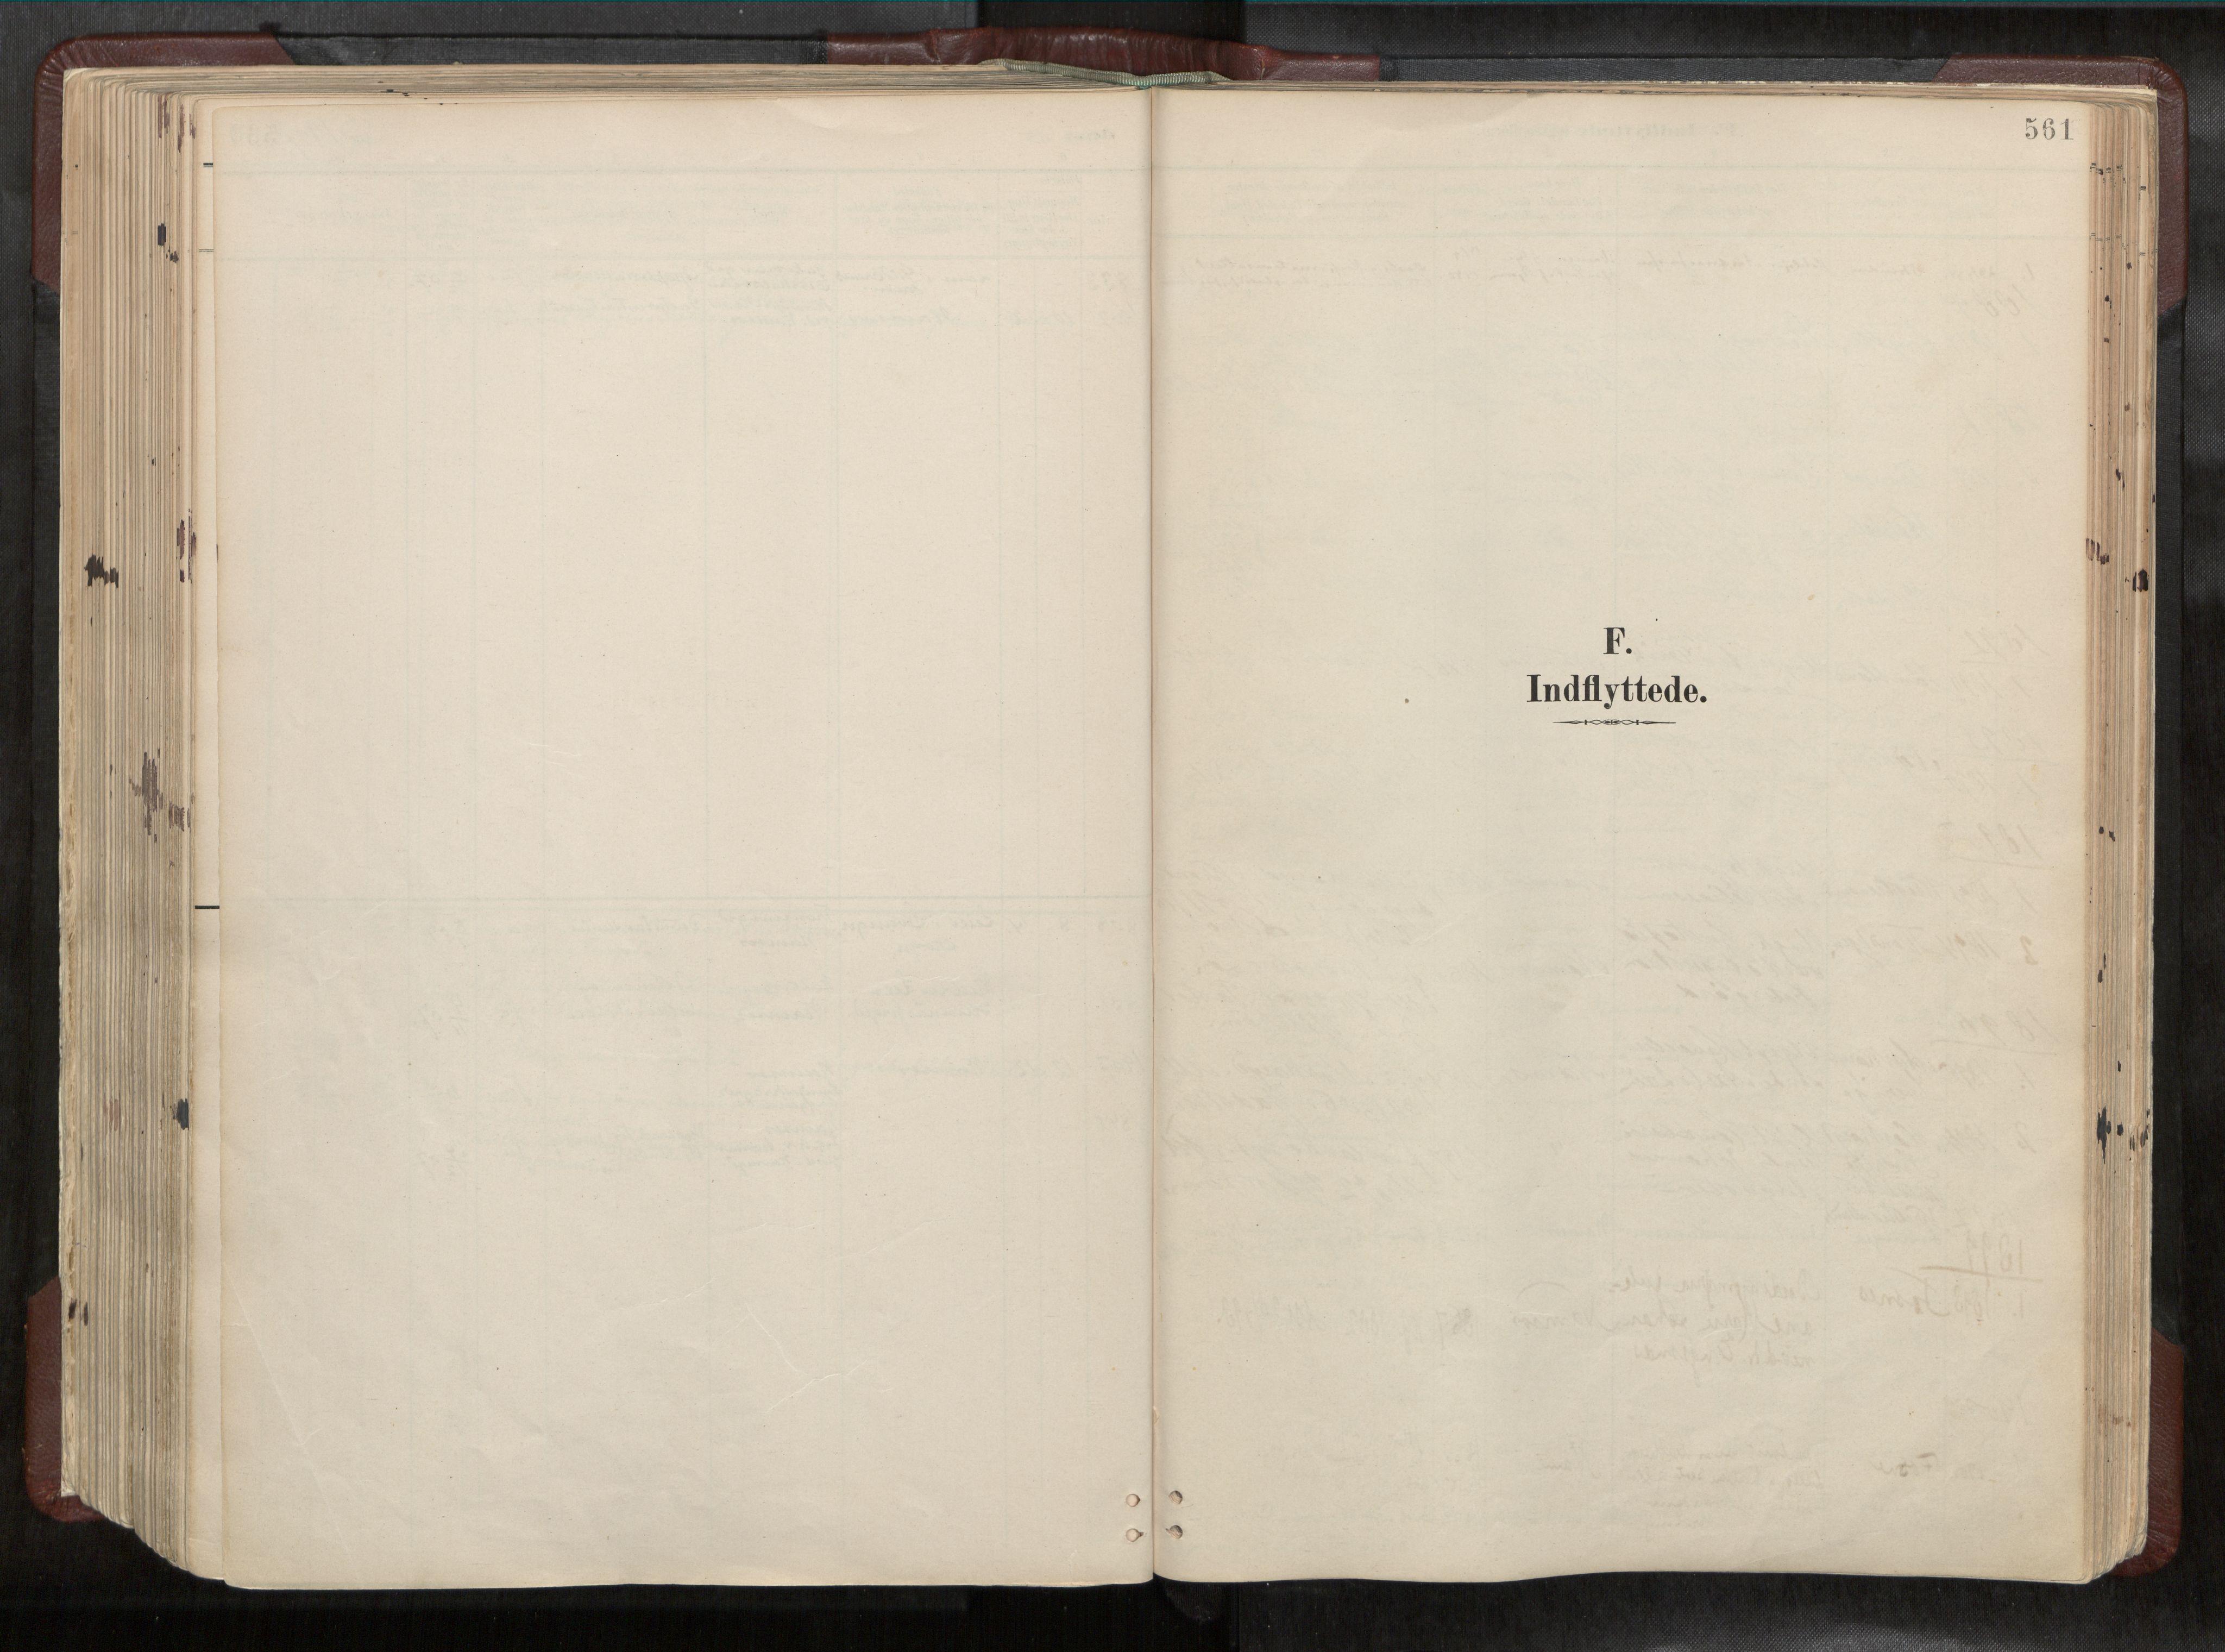 SAT, Ministerialprotokoller, klokkerbøker og fødselsregistre - Nord-Trøndelag, 768/L0579a: Ministerialbok nr. 768A14, 1887-1931, s. 561